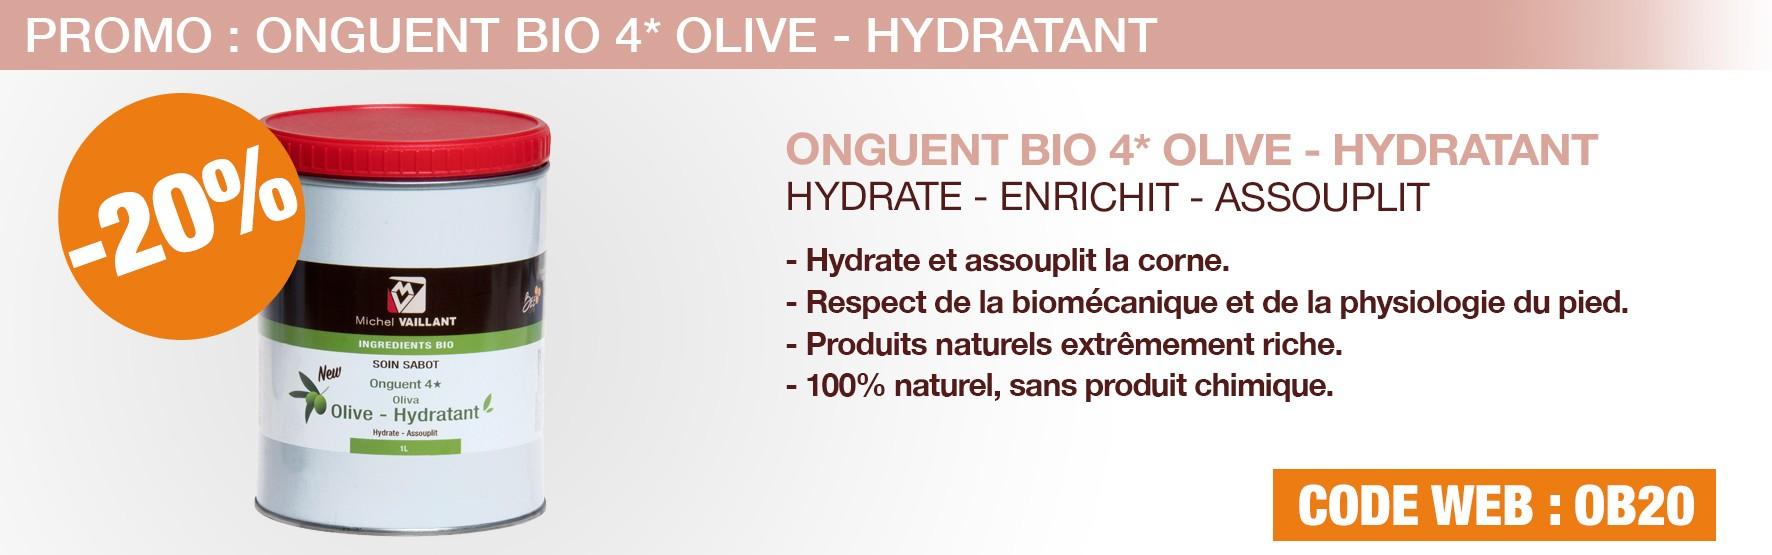 Onguent - soin - Olive - cheval - sabot - corne - hydrate - hydratant - assouplit - riche - naturel - bio